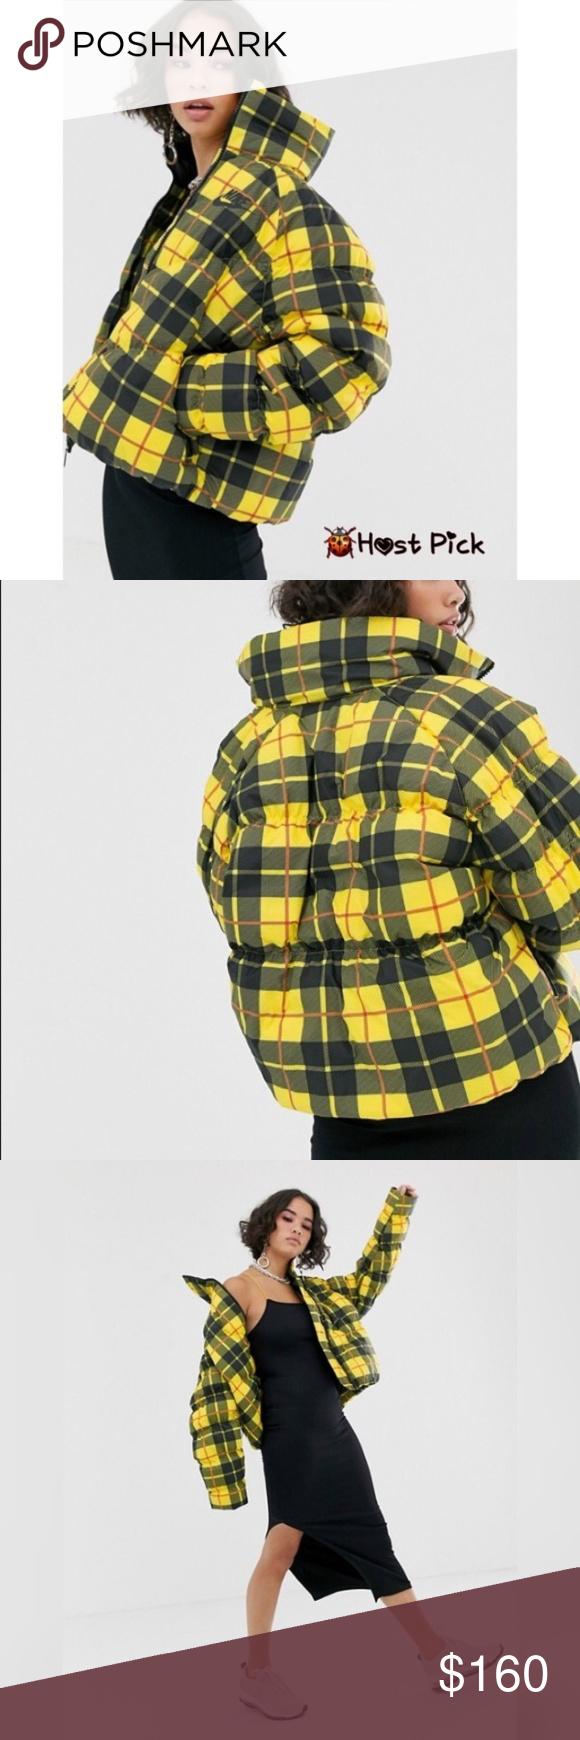 Nike Yellow High Neck Padded Jacket Snazzy Plaid Over A Soft Taffeta Shell Energizes A Warm Yet Lightwei Plaid Jacket Vintage Nike Windbreaker Nike Rain Jacket [ 1740 x 580 Pixel ]